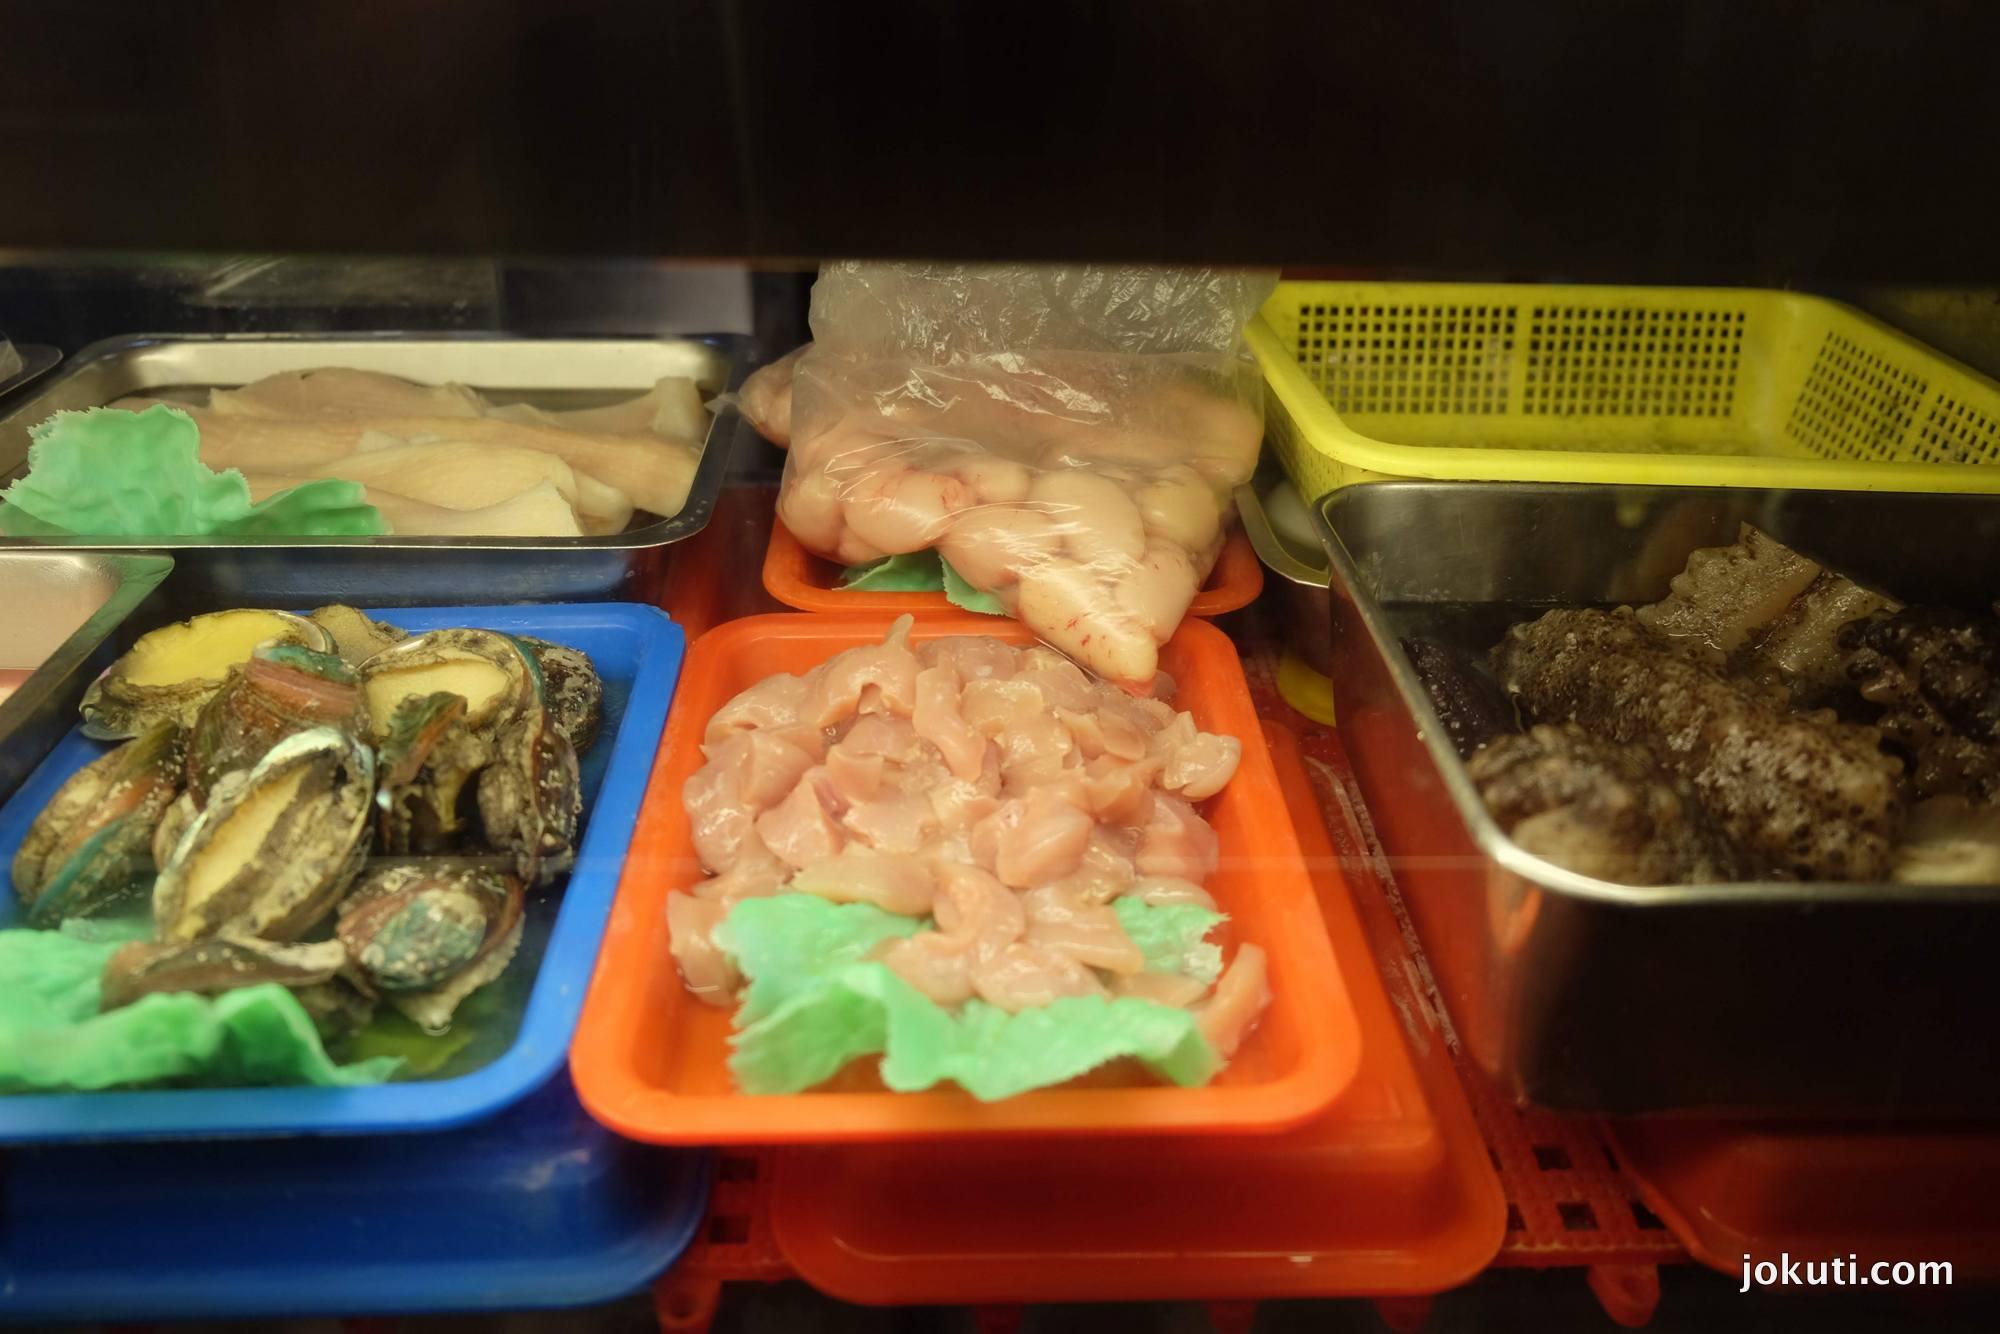 dscf3018_taipei_ming_fu_seafood_michelin_taiwan_vilagevo_jokuti.jpg